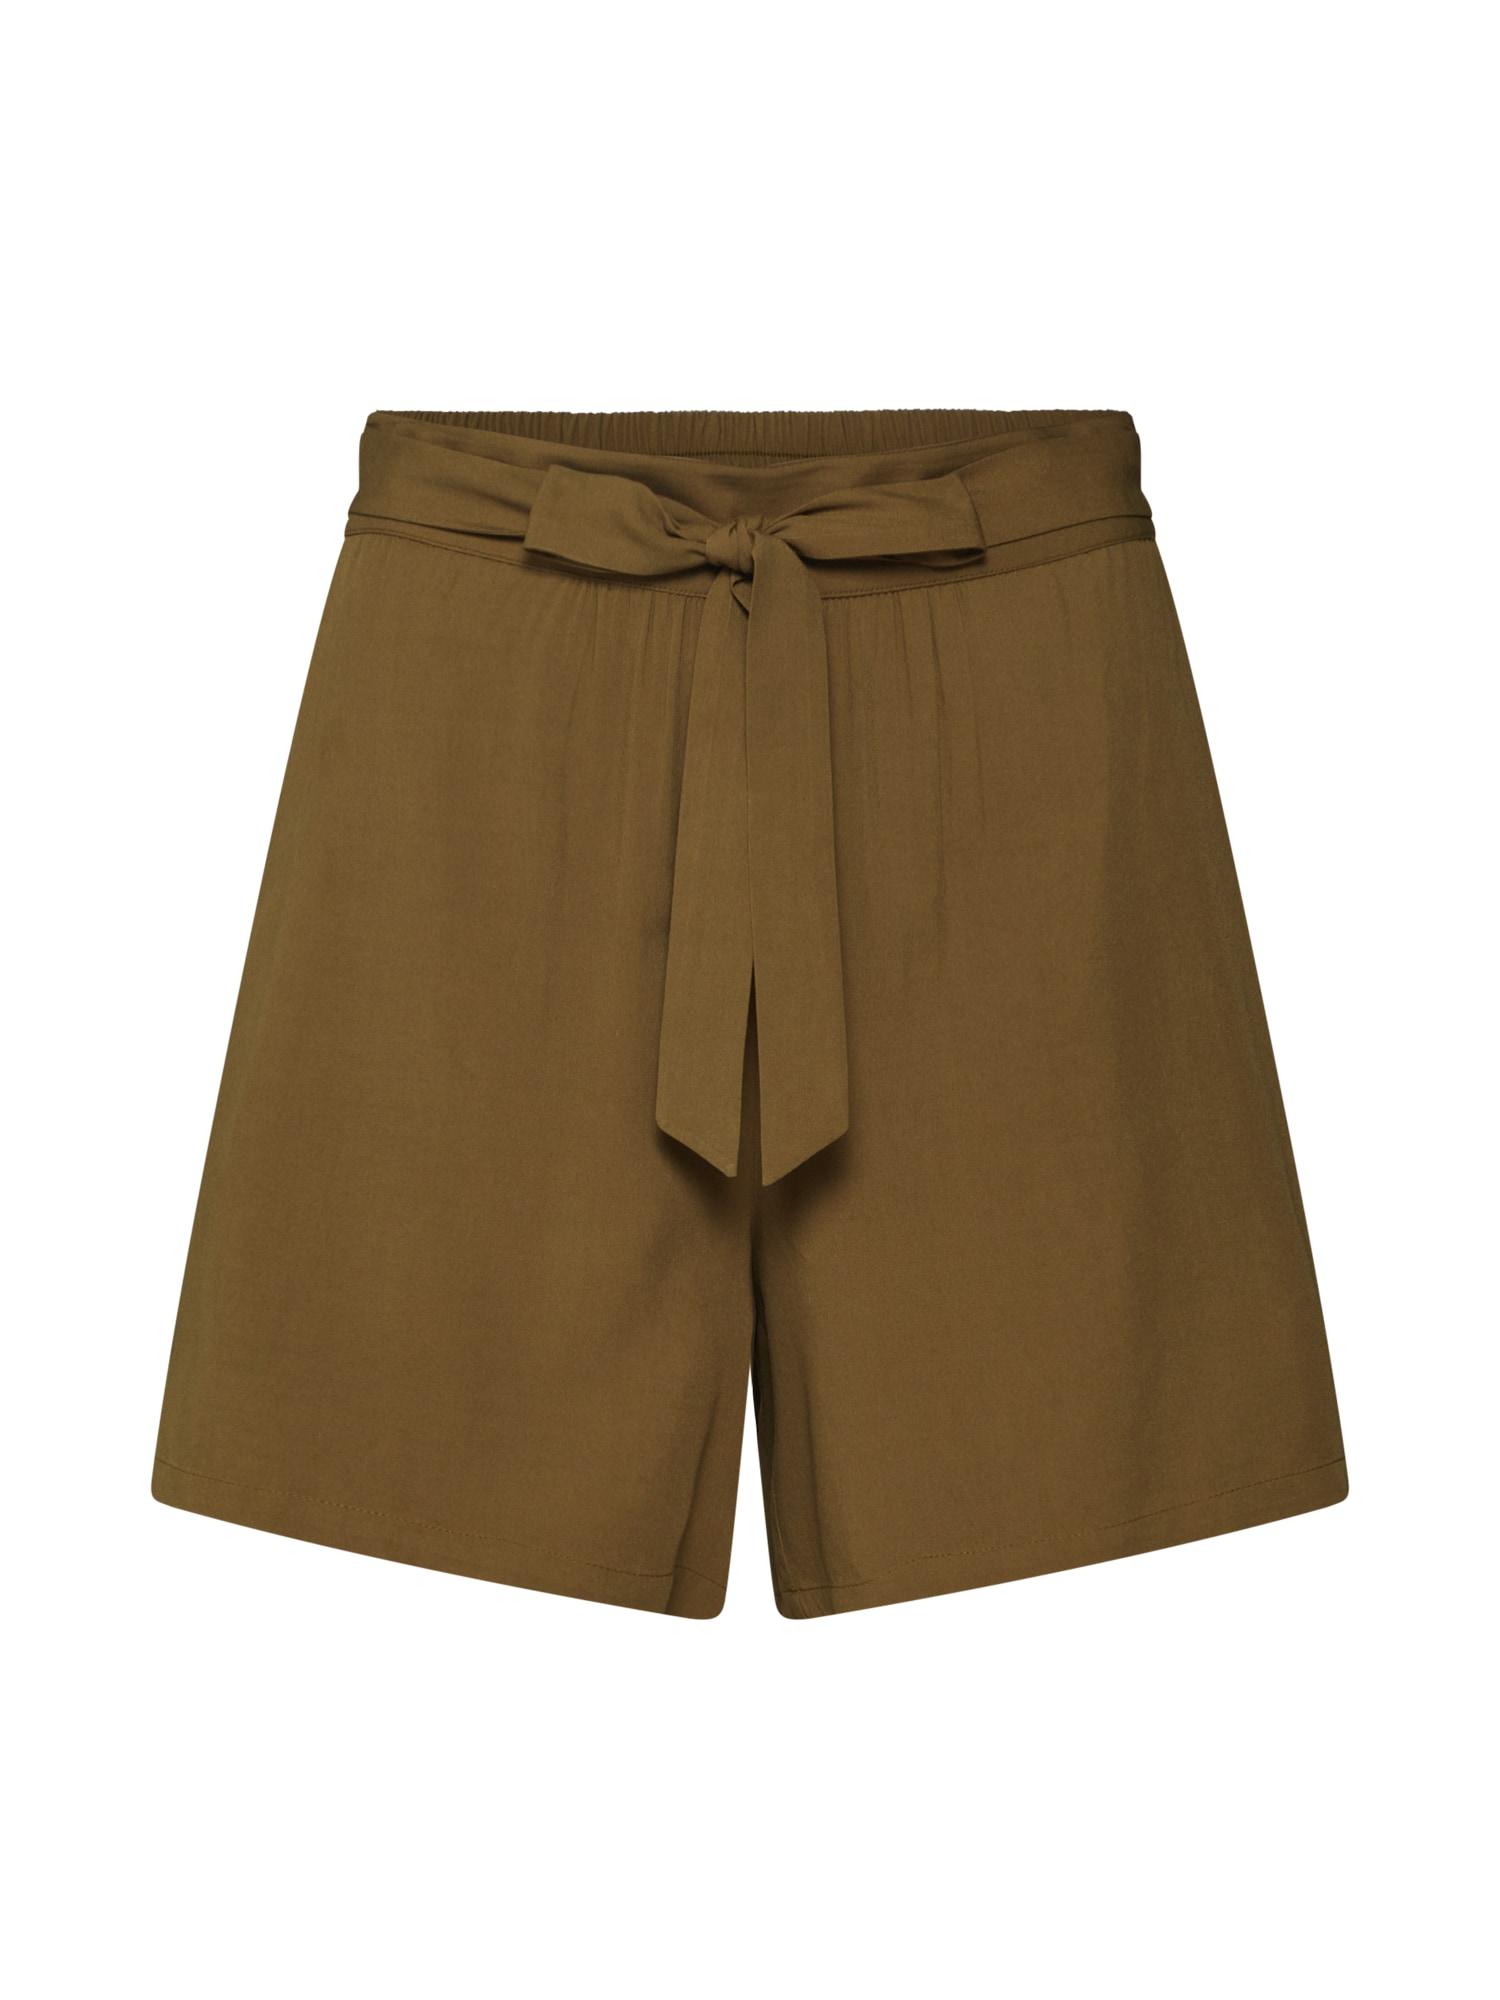 Kalhoty VIAMONA SHORTS olivová VILA